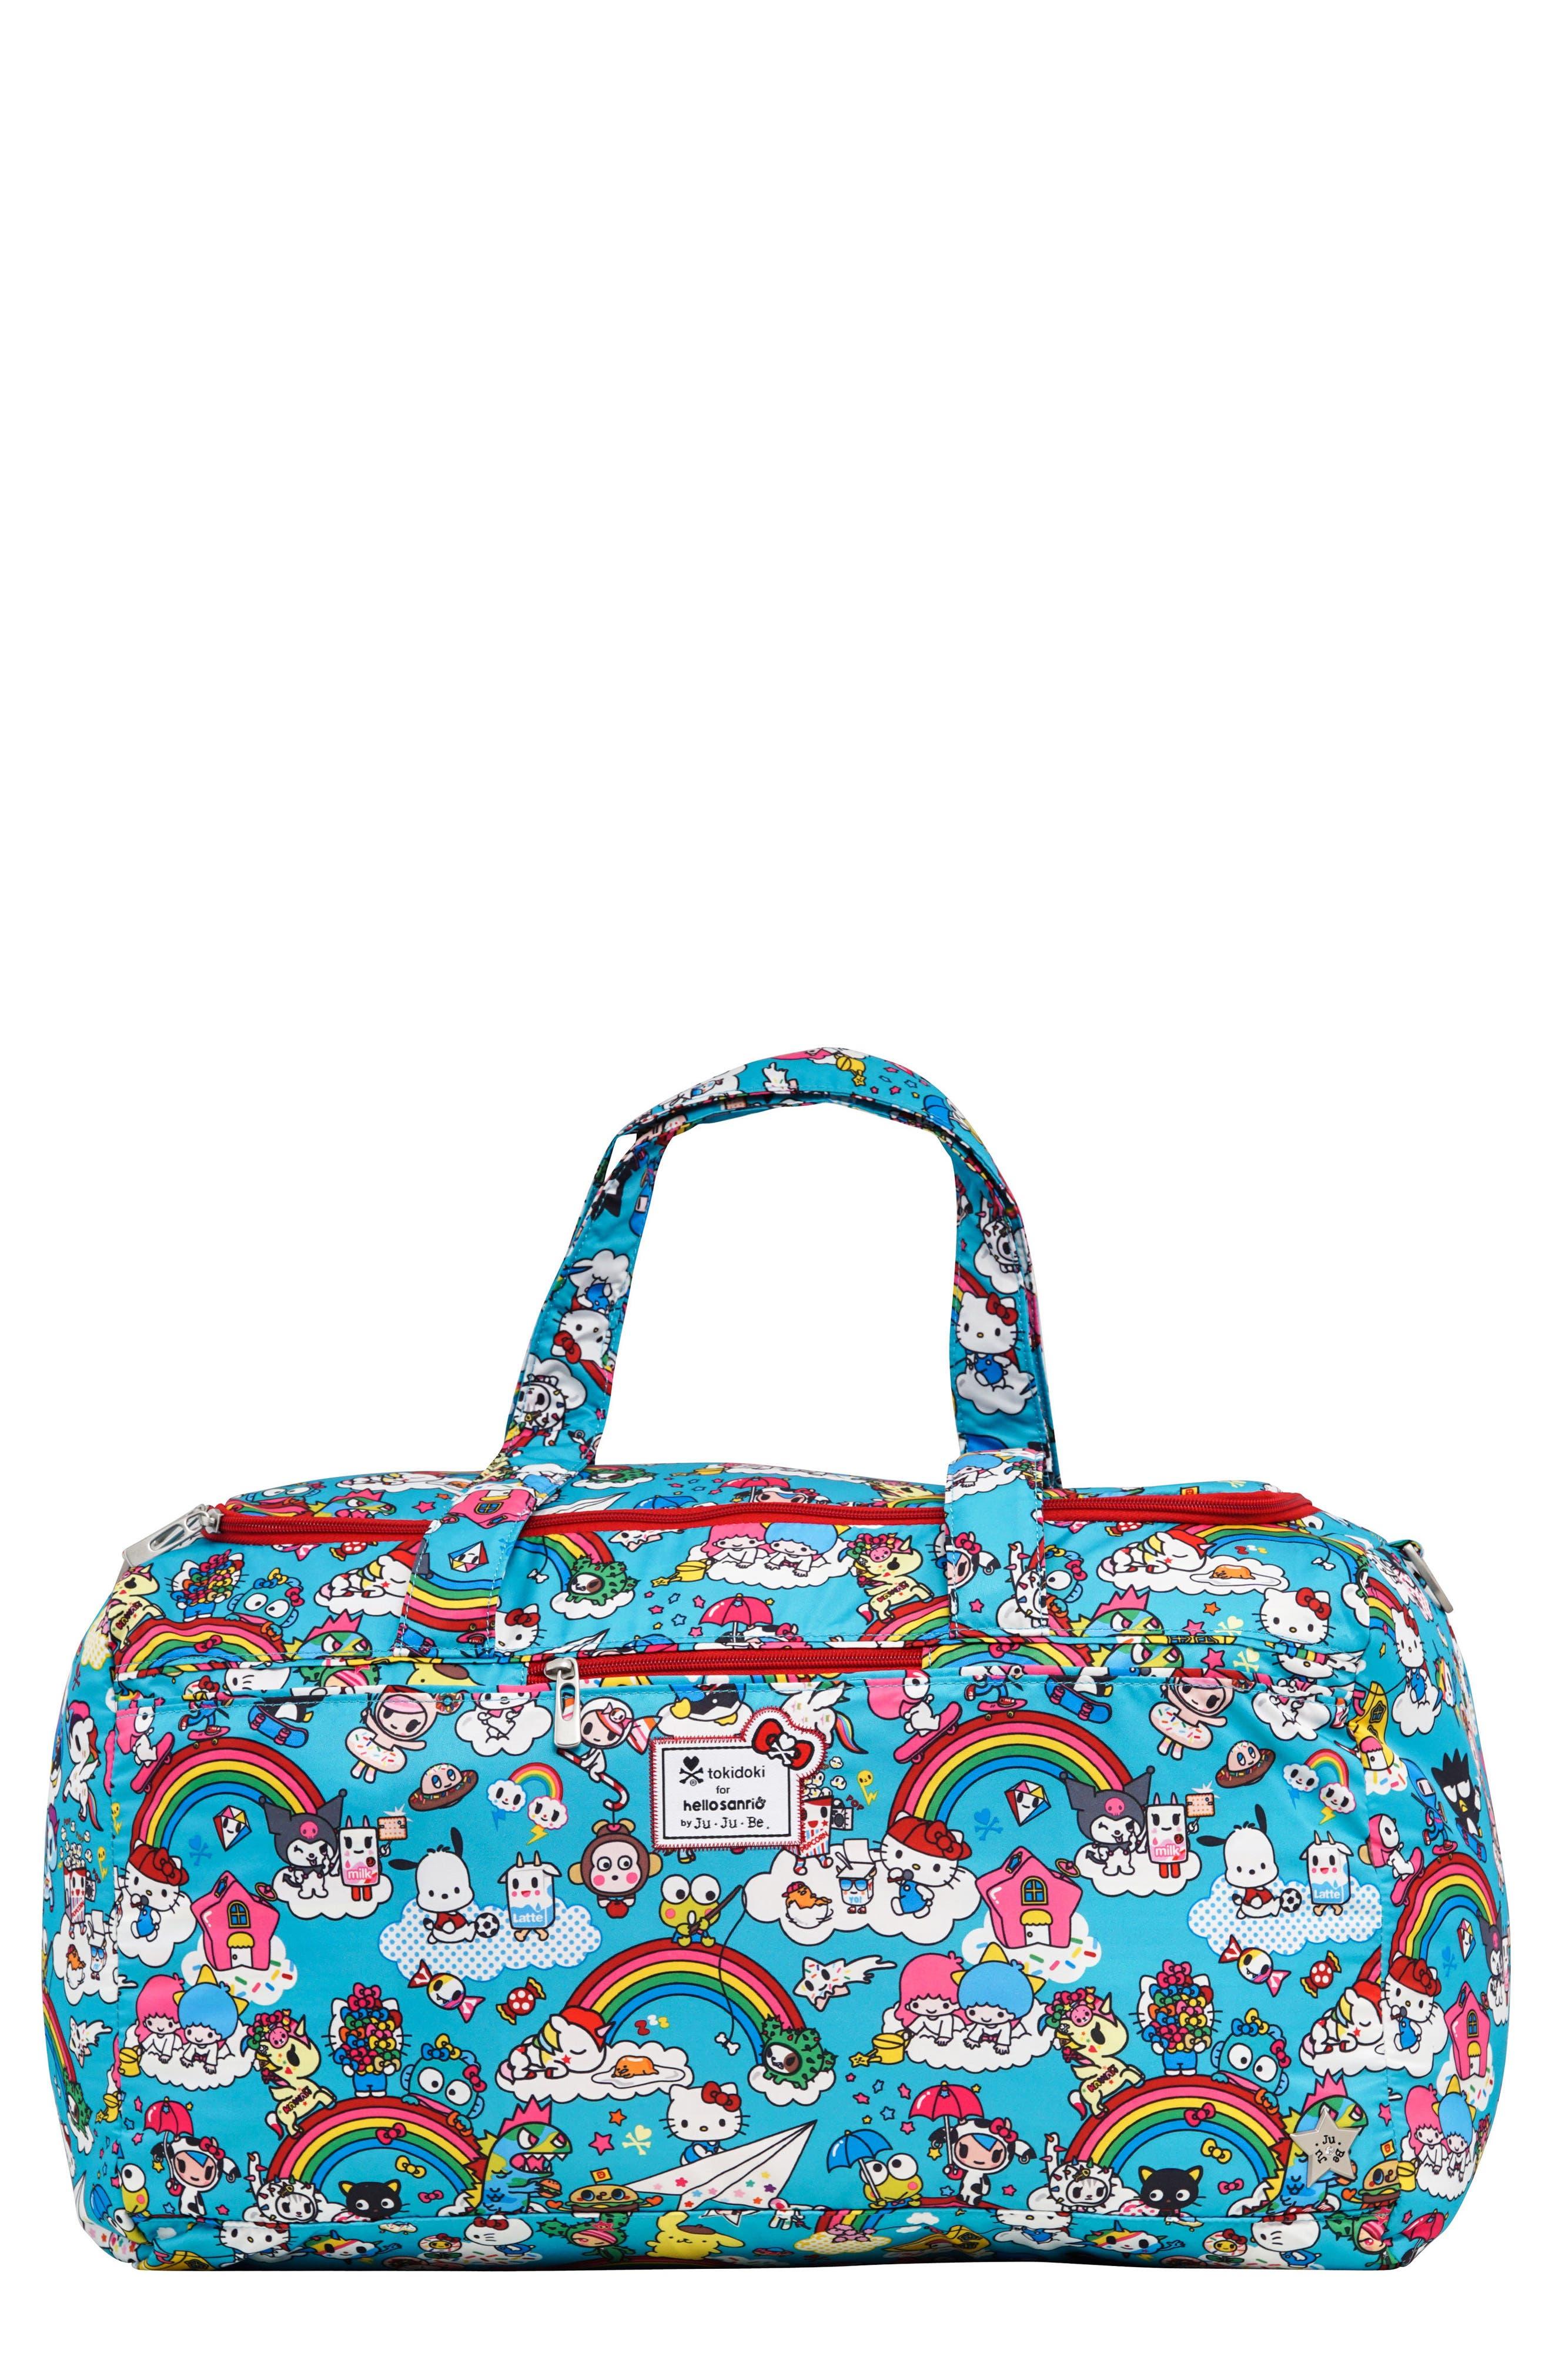 x tokidoki for Hello Sanrio Rainbow Dreams Super Star Diaper Bag,                         Main,                         color, 433